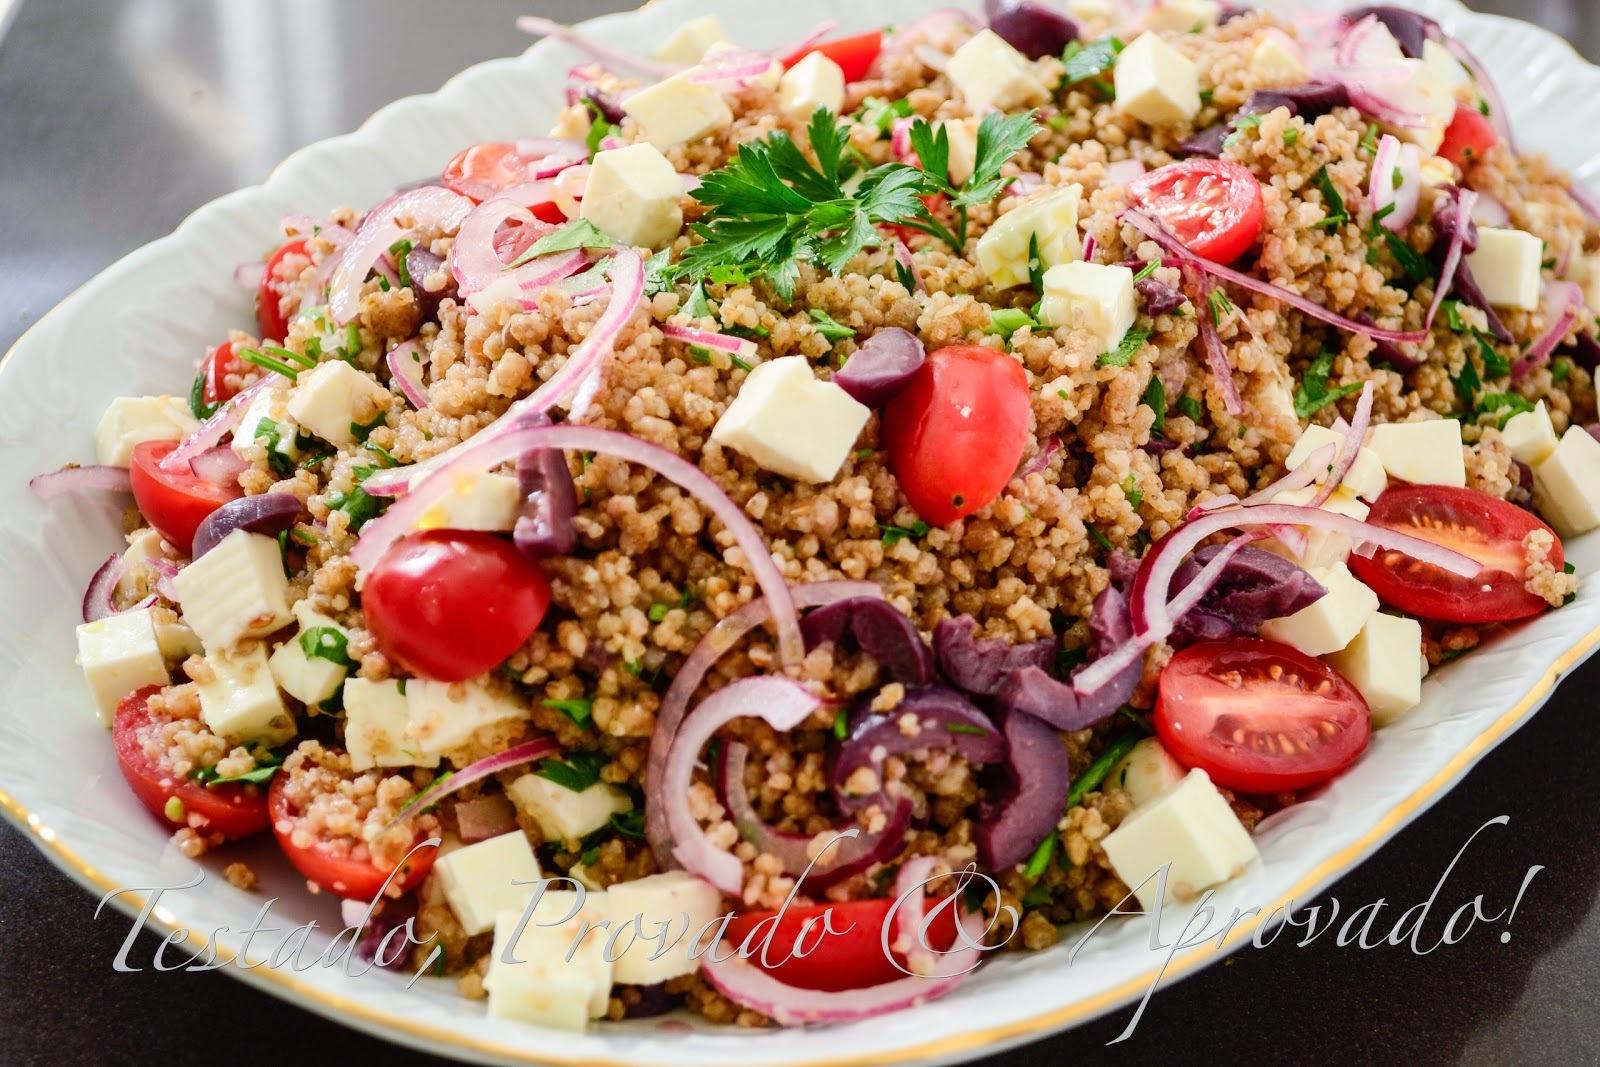 MAFTOUL, o cuscuz que veio da Palestina - Desafio Daring Cooks - Maio / 2014